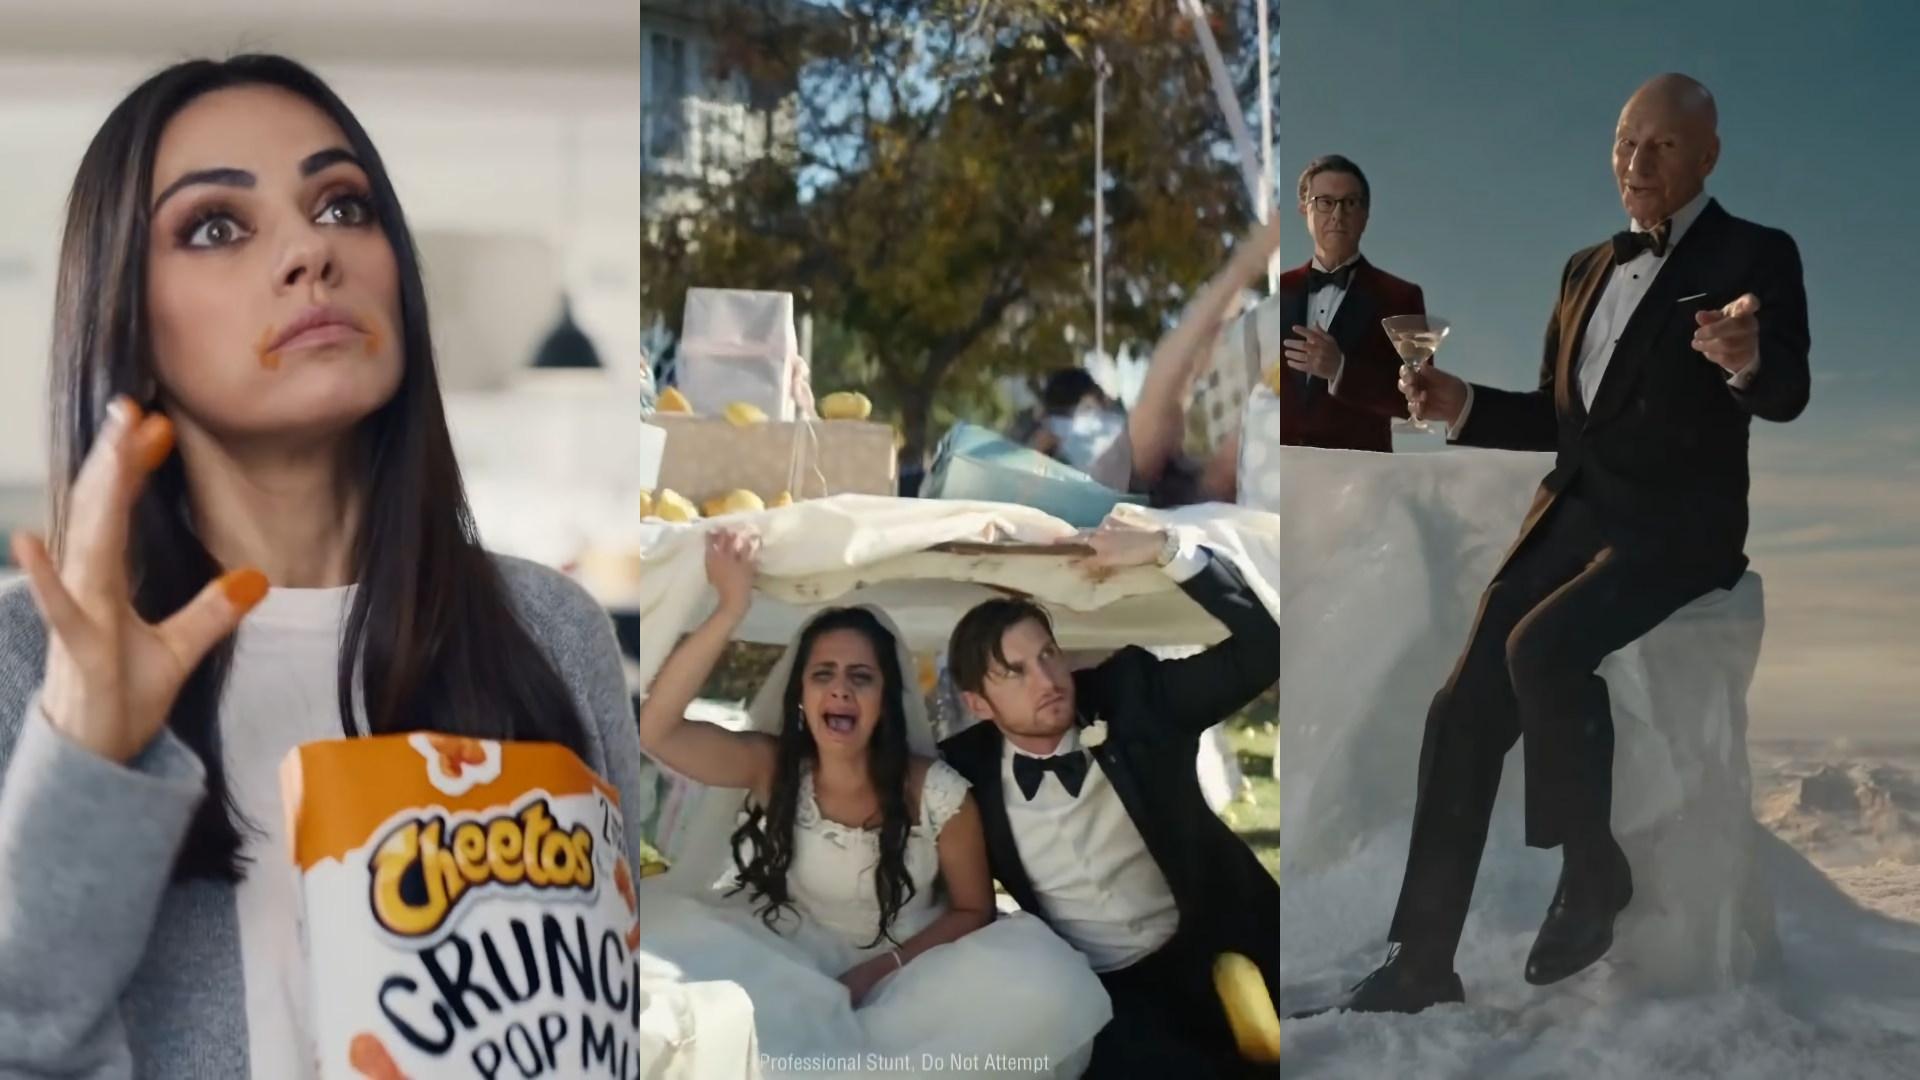 Super Bowl, Super Bowl 2021, Ads, Werbespots, Clips, US-Fernsehen